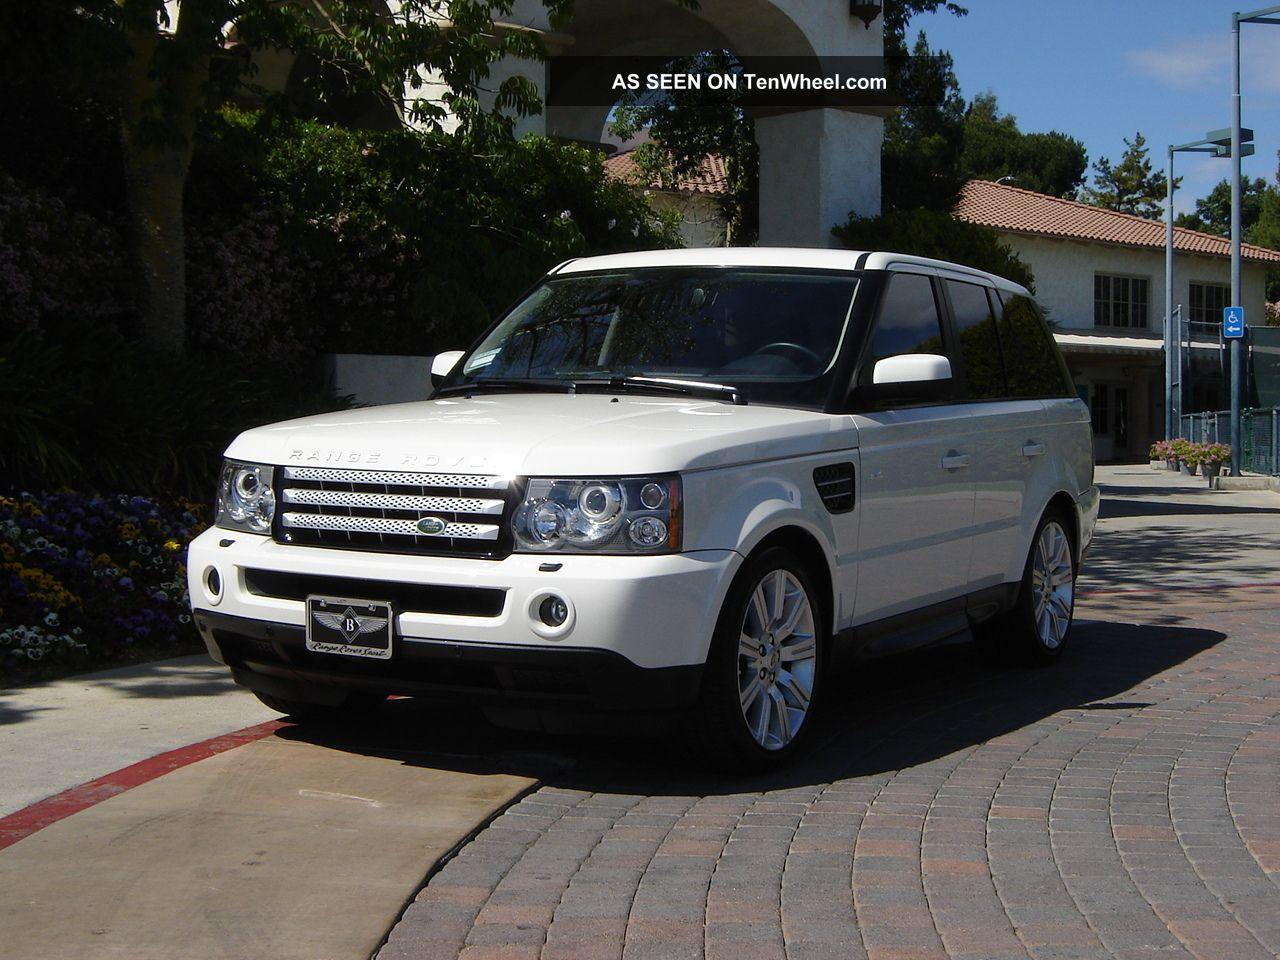 2009 Range Rover Sport Luxury Ed.  White / Black,  2011 Upgrades,  Immac.  So.  Ca.  Car Range Rover Sport photo